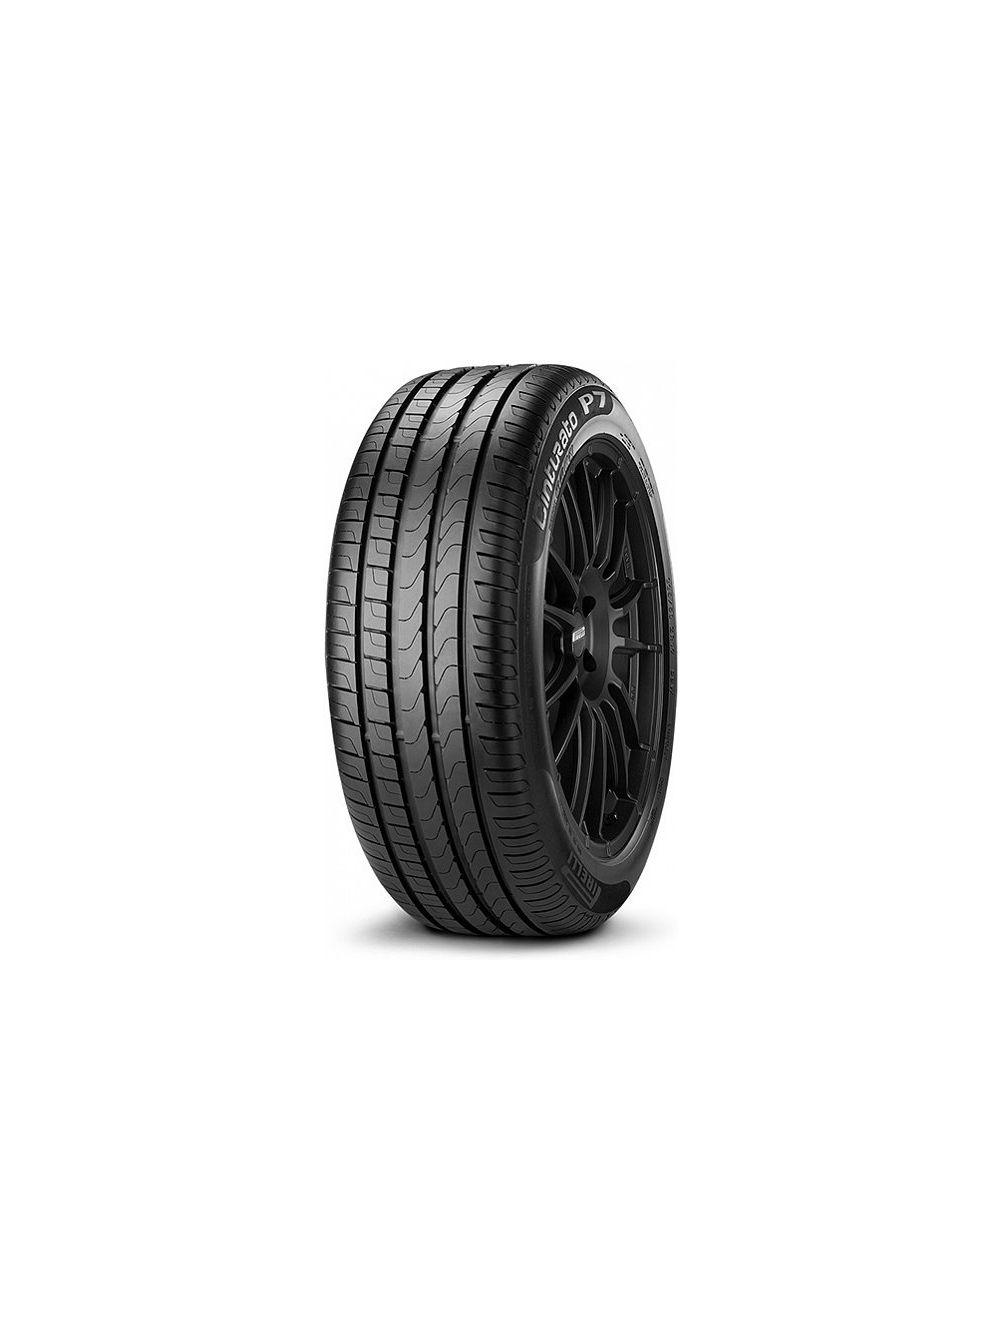 Pirelli 225/50R17 Y P7 Cinturato XL AO Nyári gumi